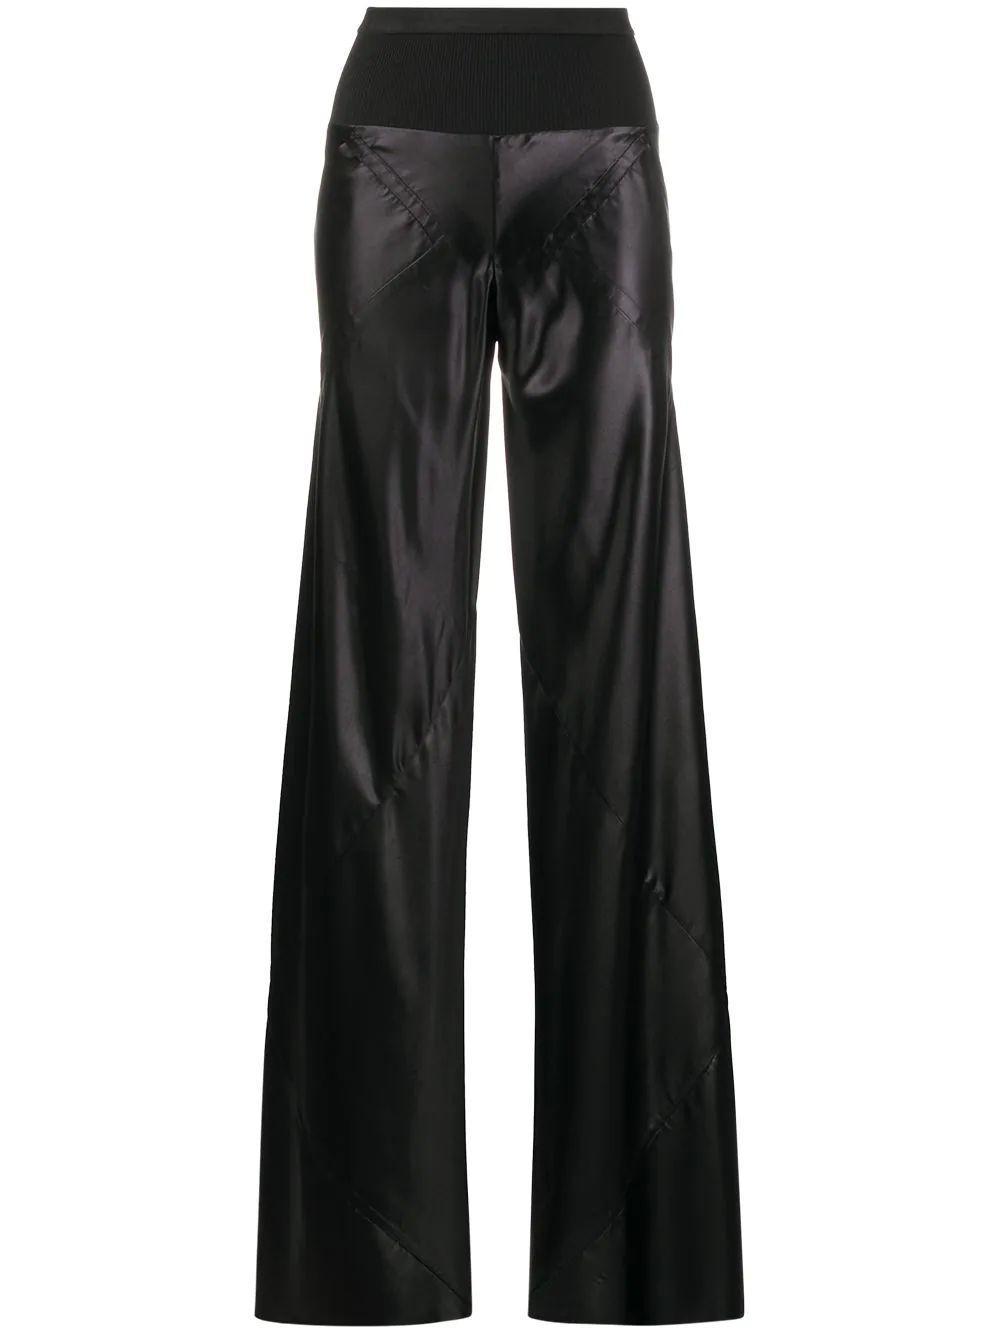 Liquid Leather Bias Cut Printed Pant Item # RP20F2301